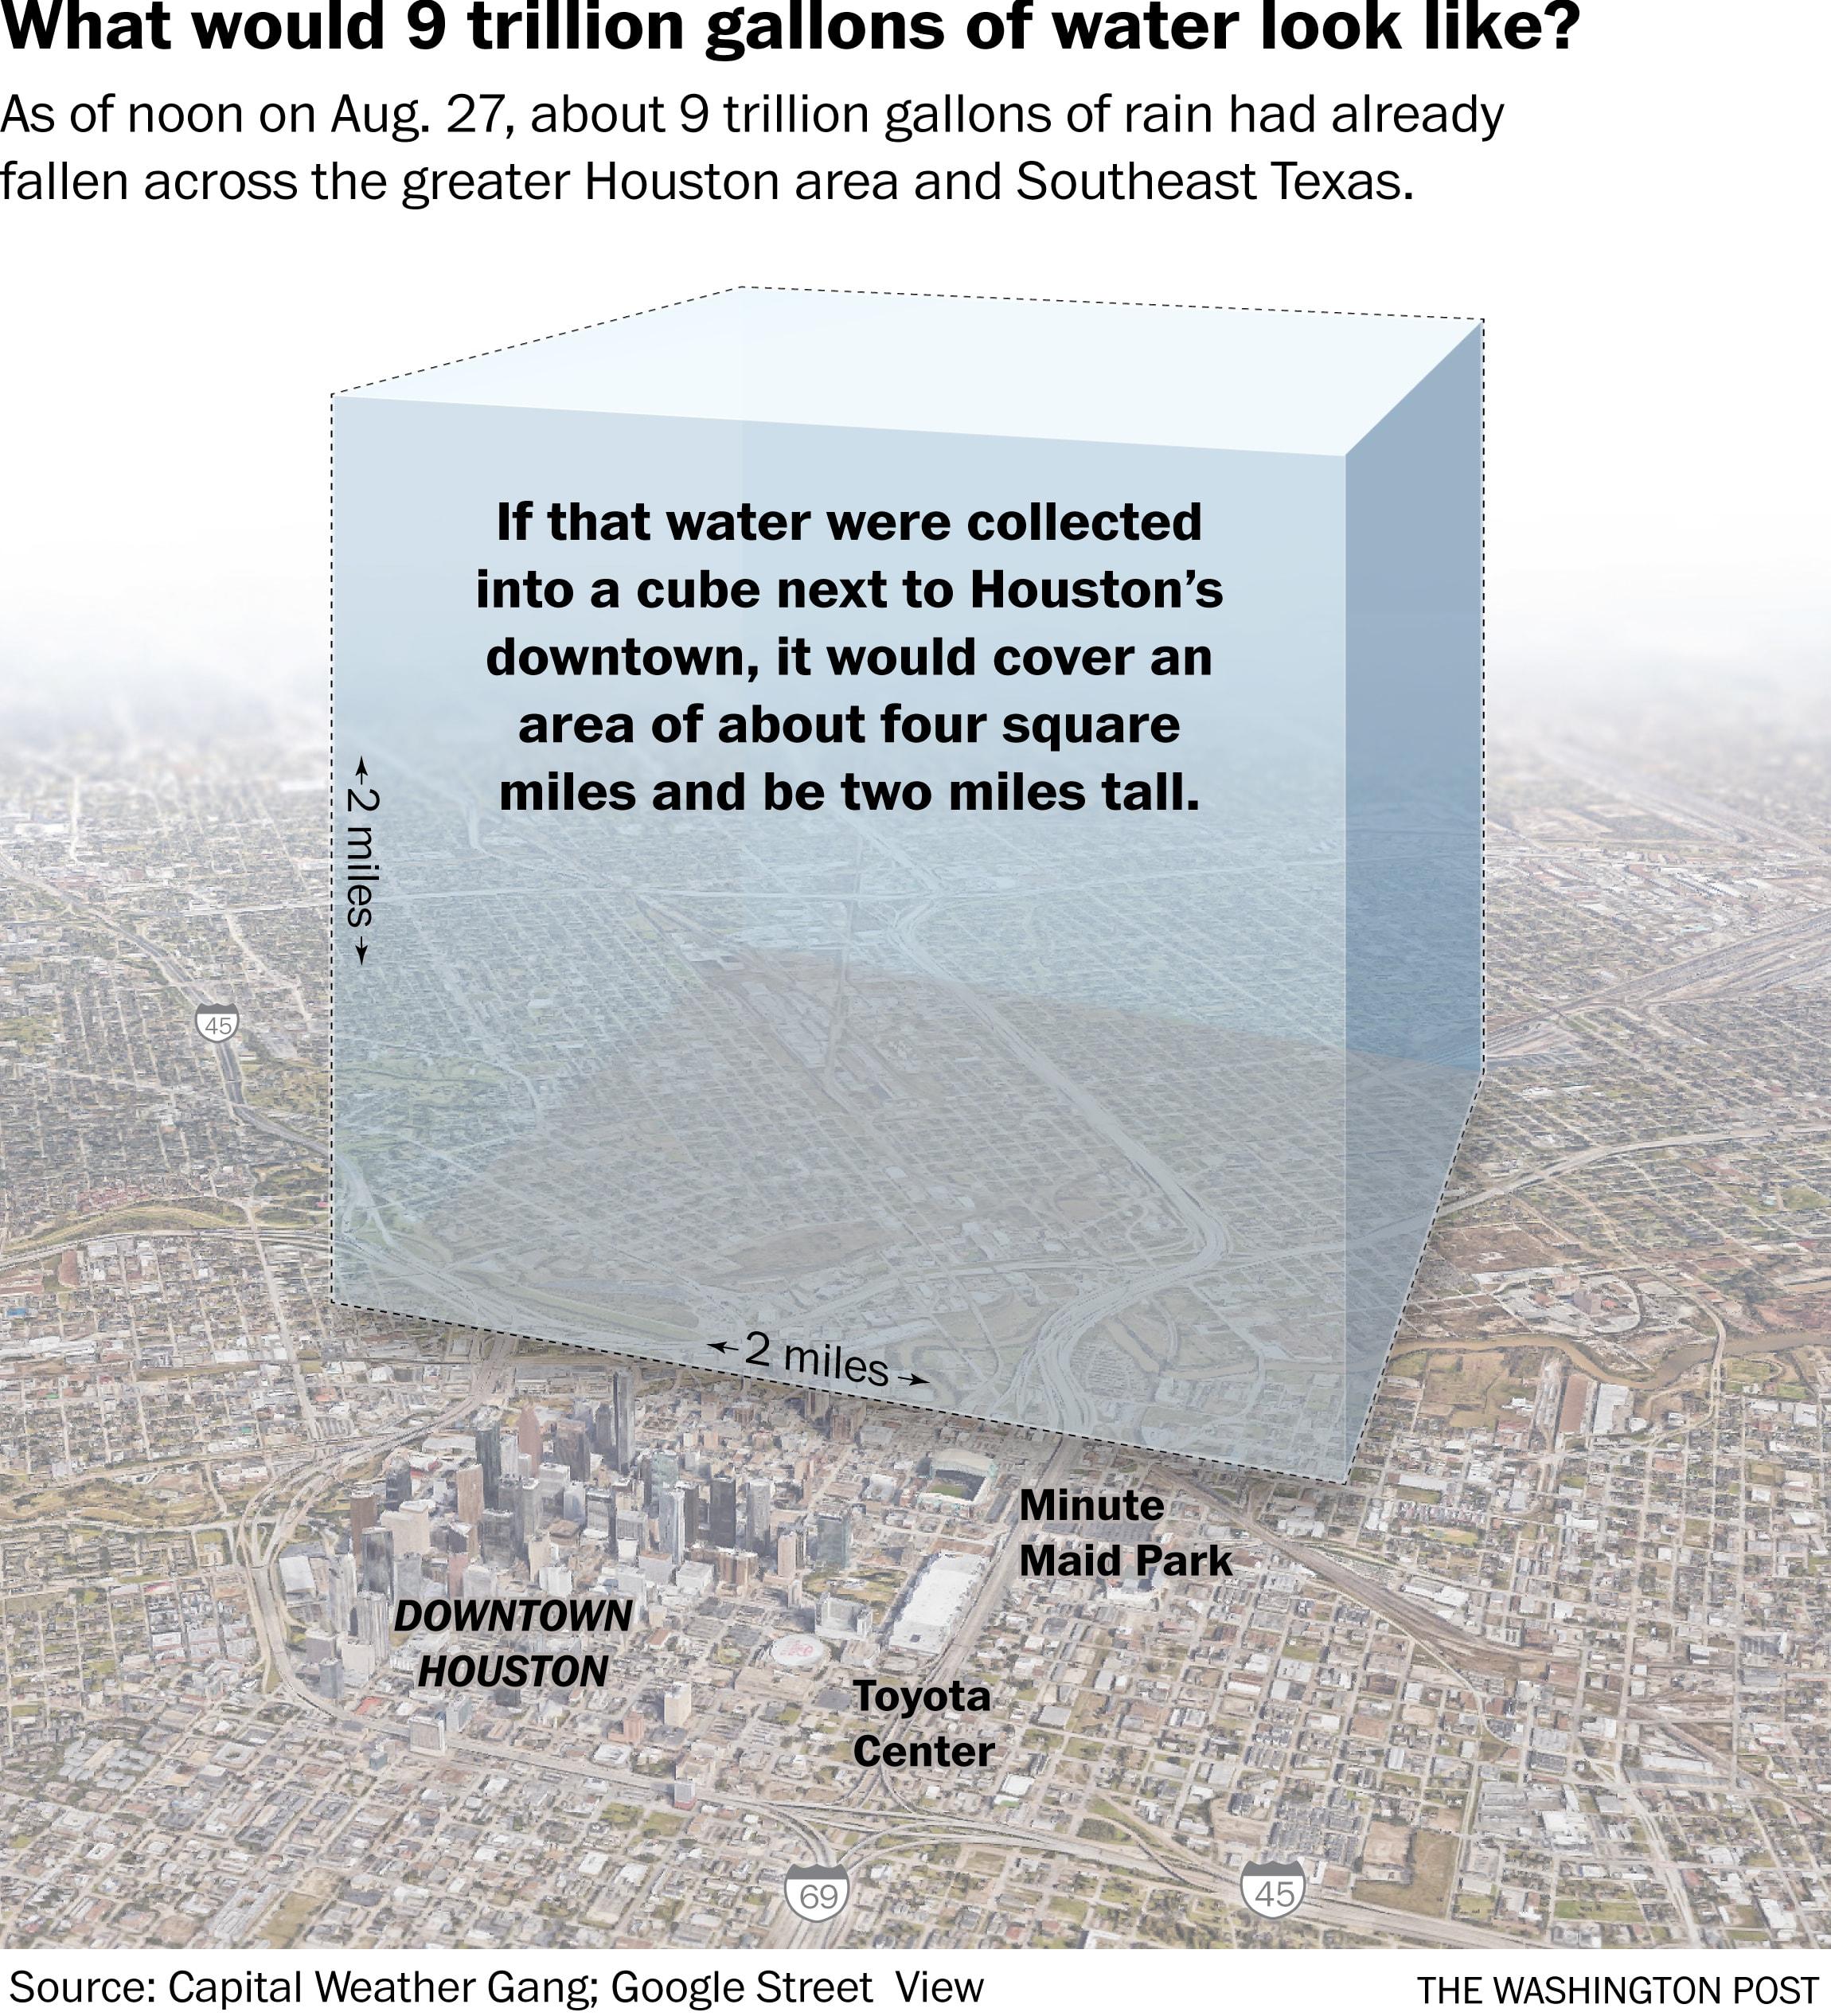 Fuente: Washington Post